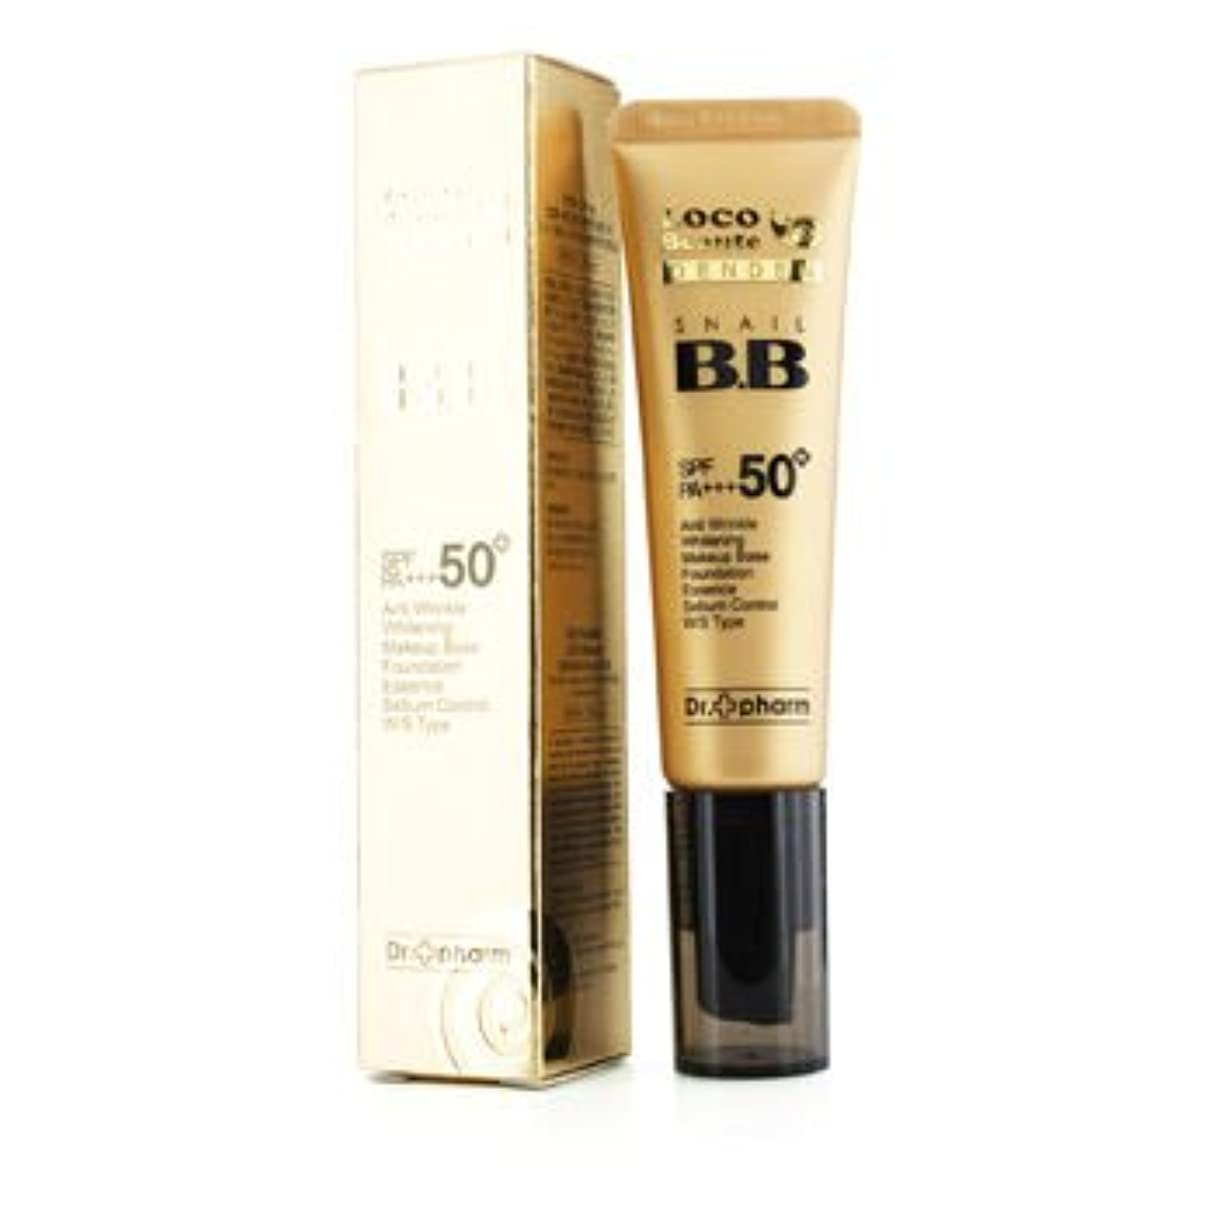 特許米国重大Dr. Pharm LOCO Beaute DenDen Snail BB Cream SPF5030ml/1oz並行輸入品